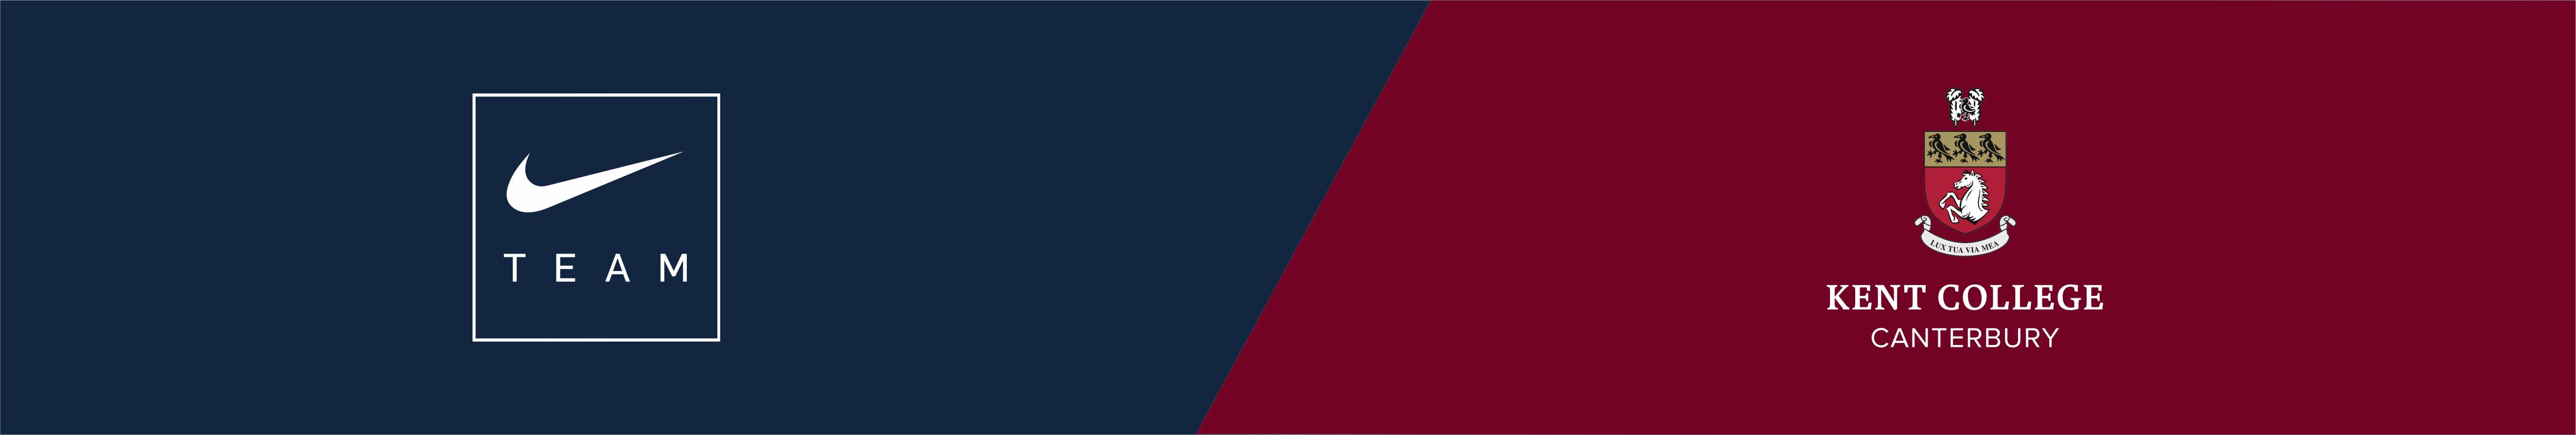 kent-college-banner.jpg